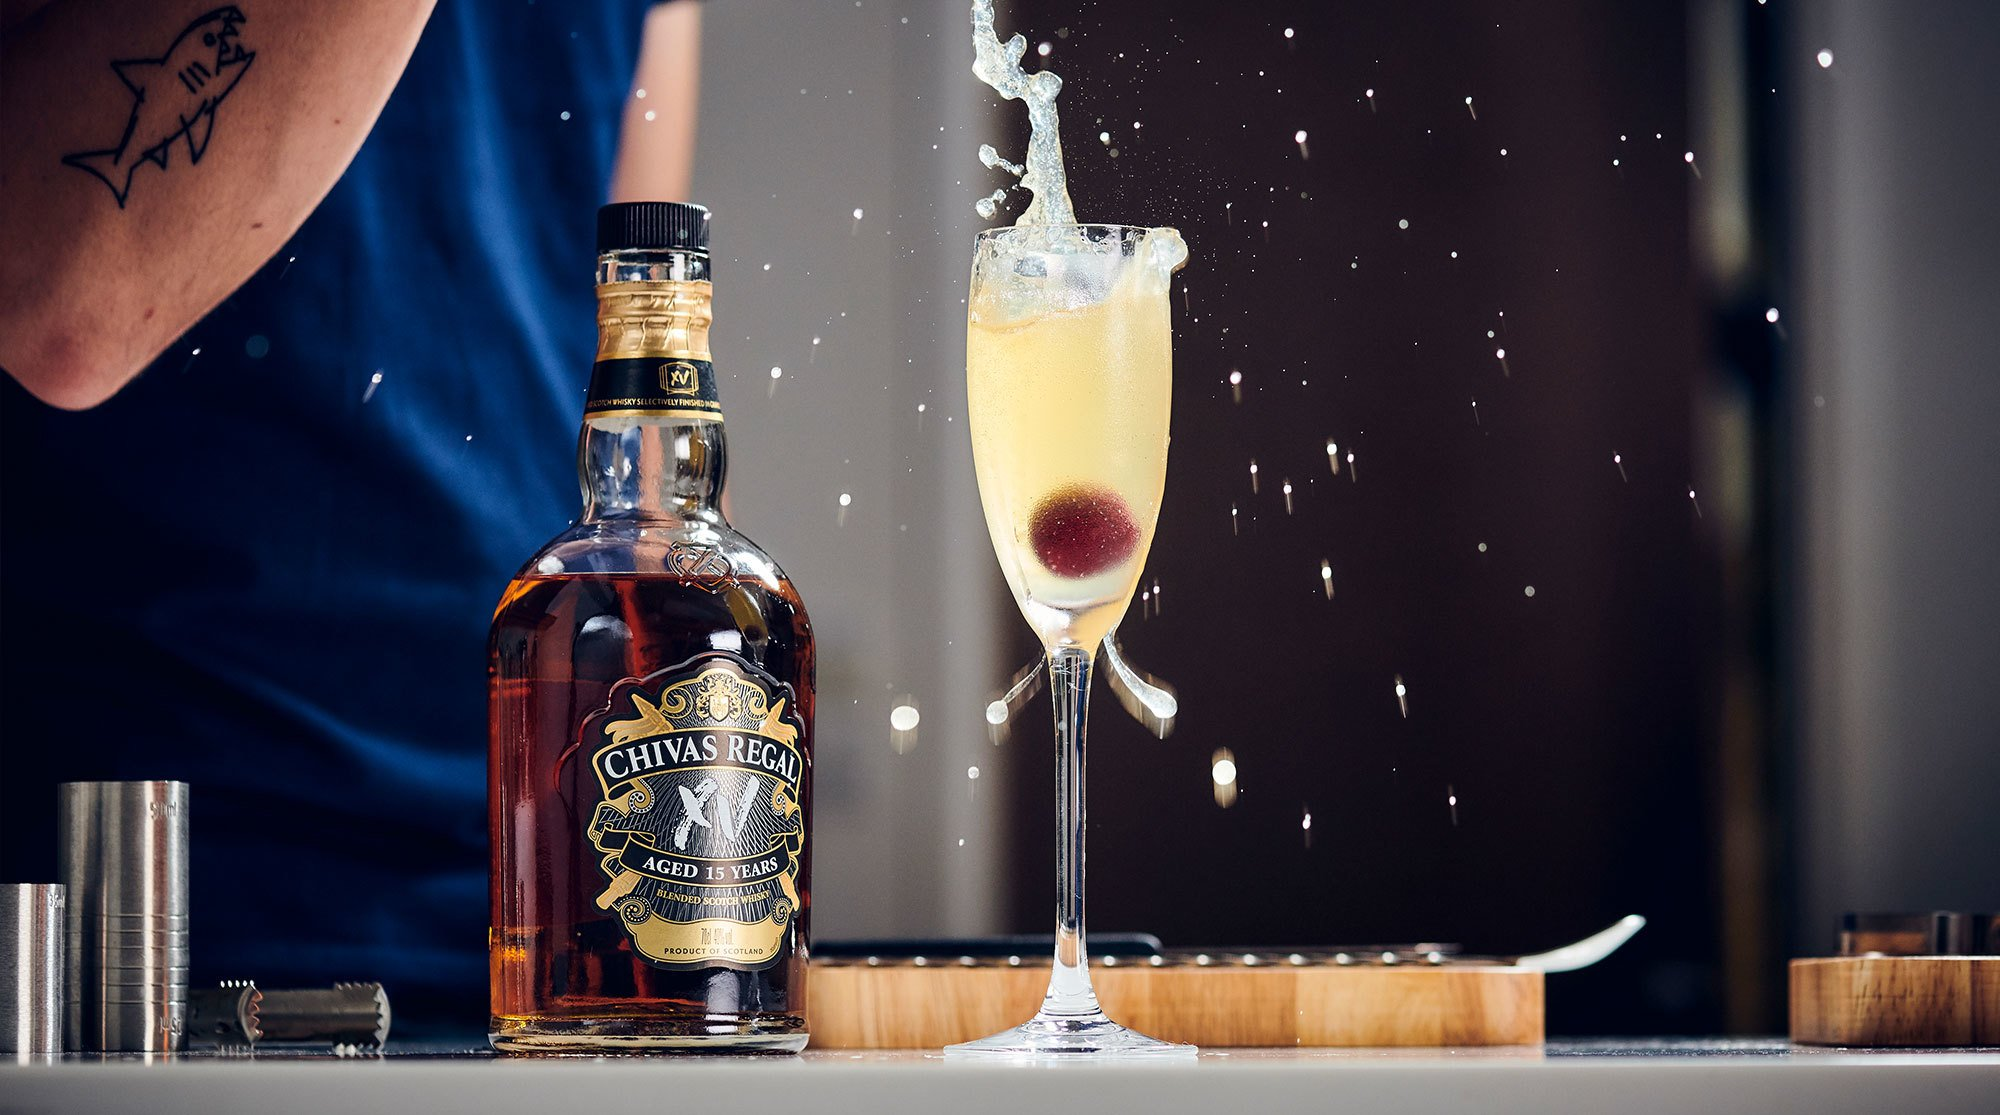 Chivas XV Chivas 75 Cocktail